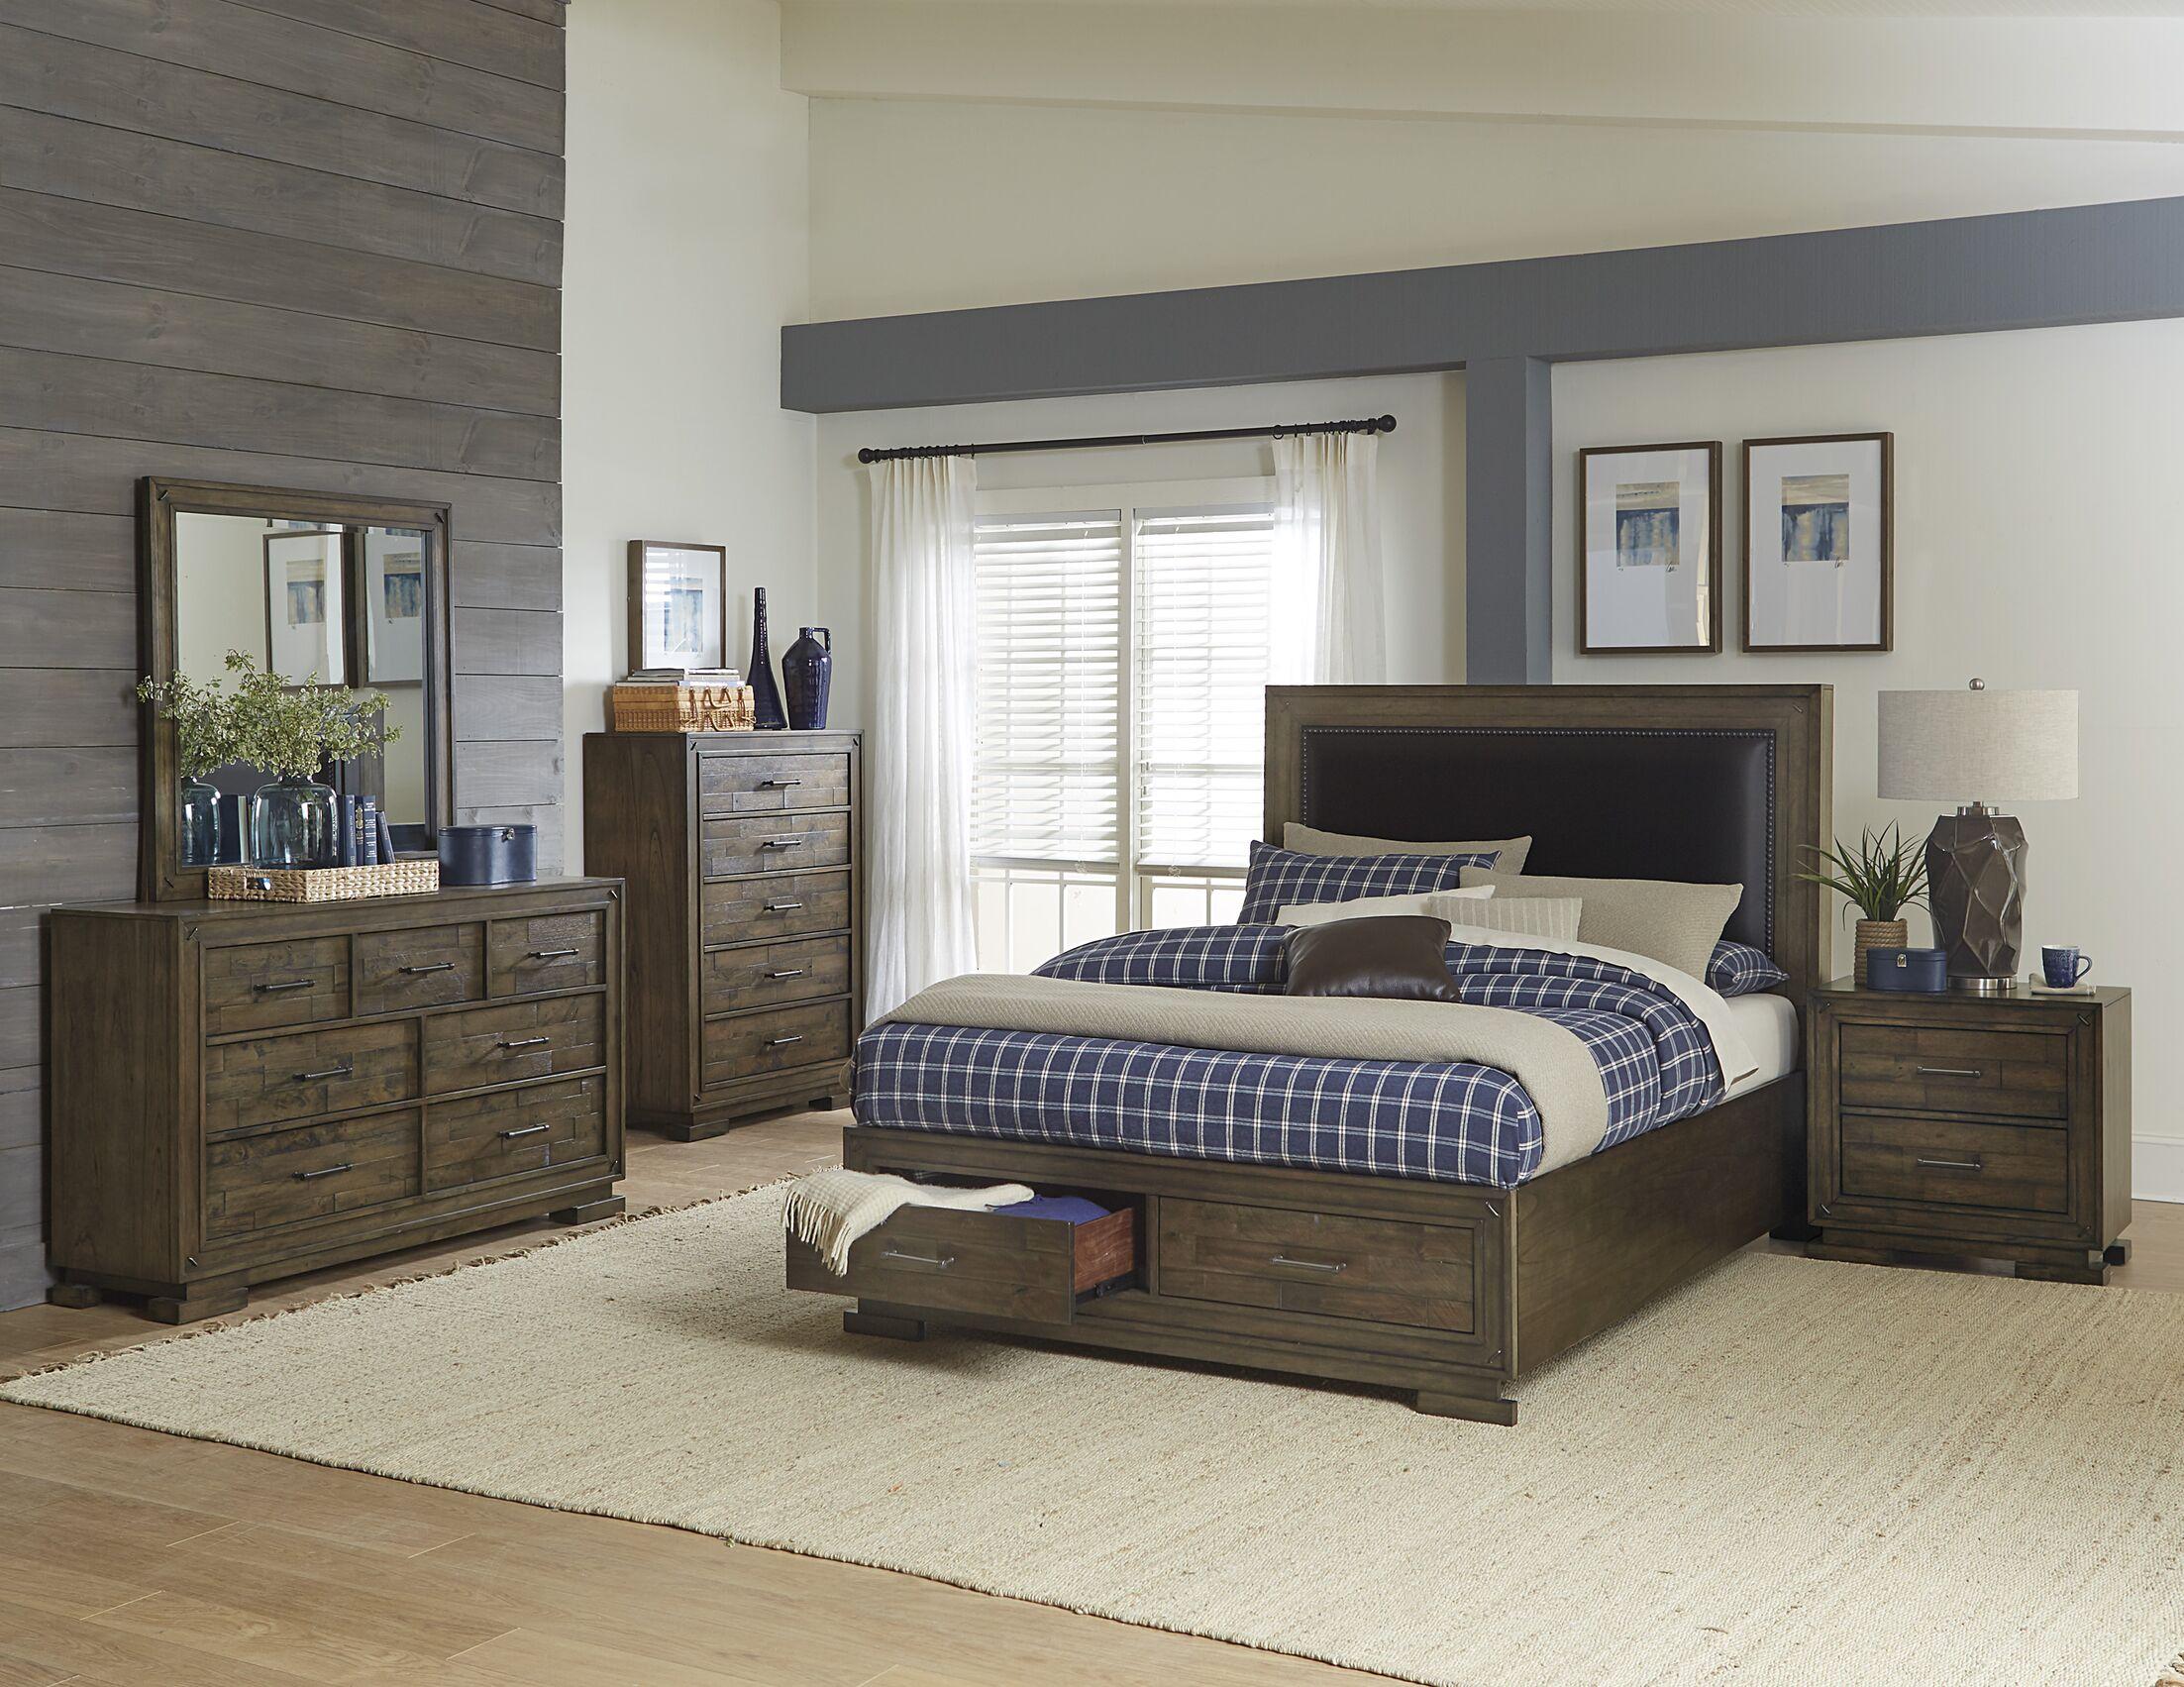 Shorehamby Upholstered Storage Platform Bed Size: Queen